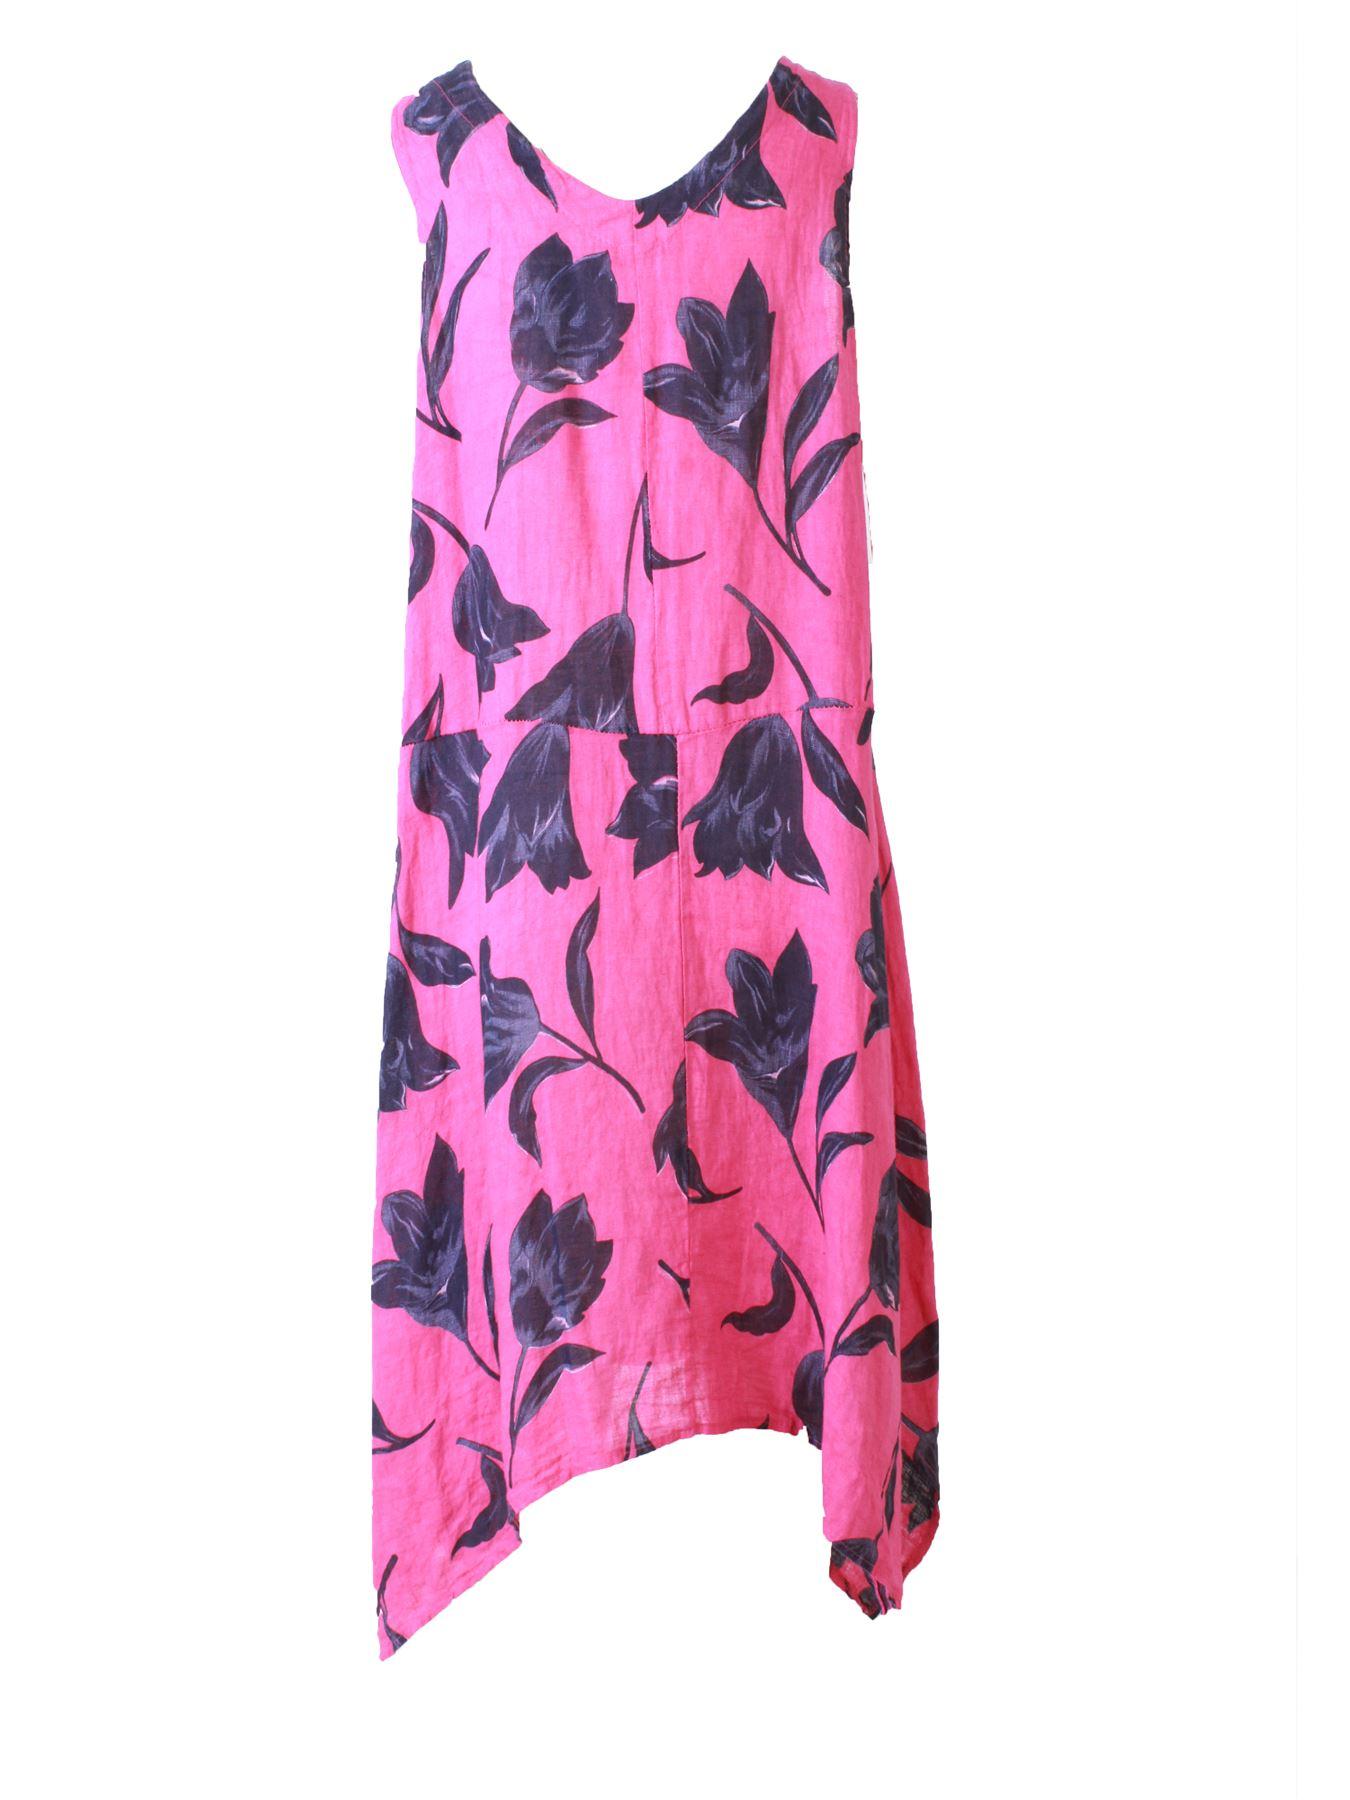 Womens-Tulip-Floral-Print-Italian-Lagenlook-Ladies-Linen-Dress-Two-Button-V-Neck thumbnail 9